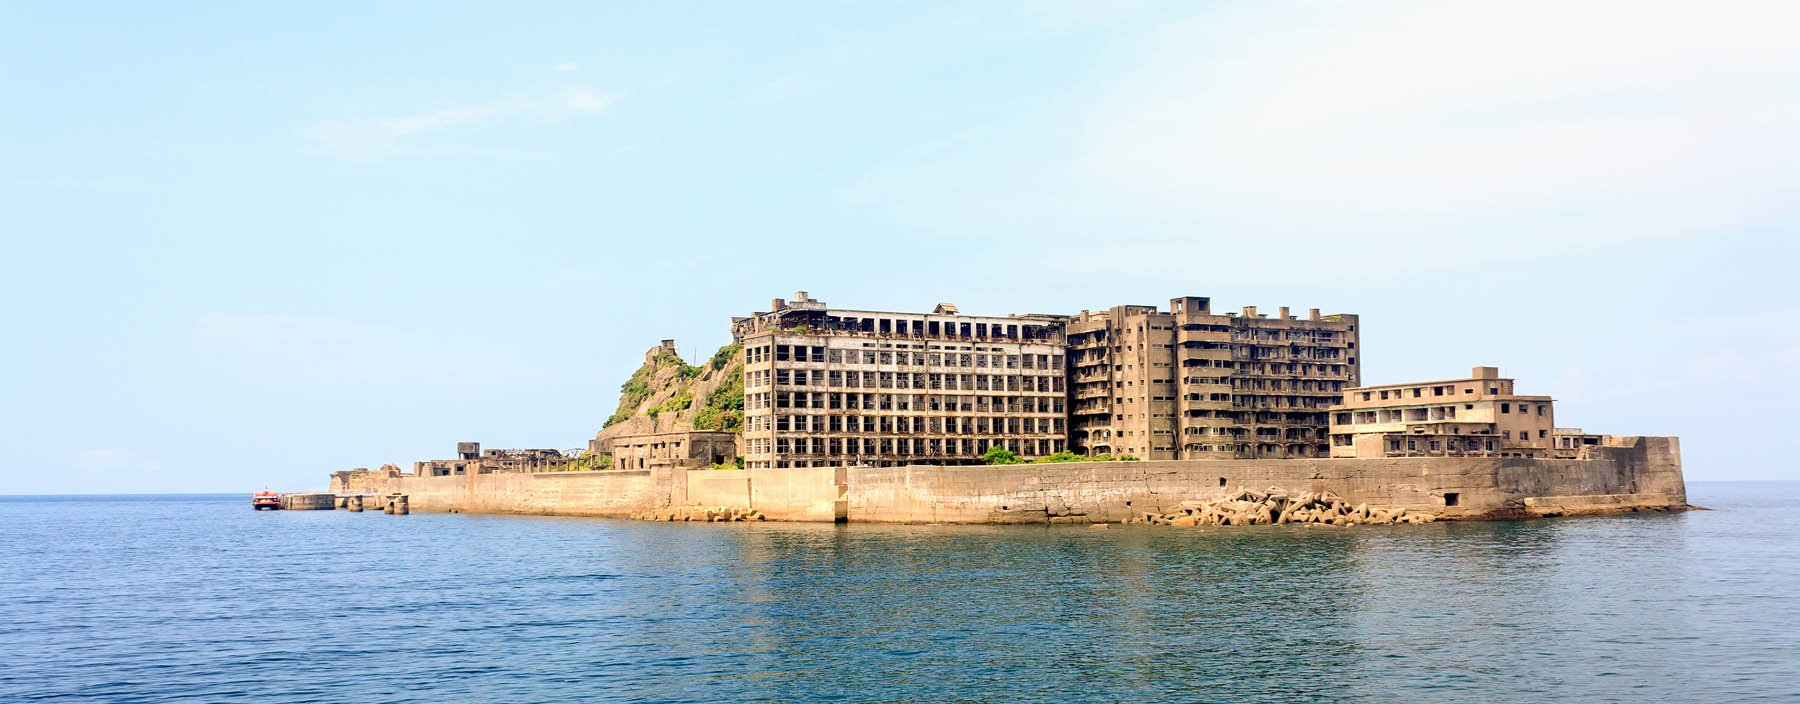 jp, nagasaki, gunkanjima eiland (1).jpg